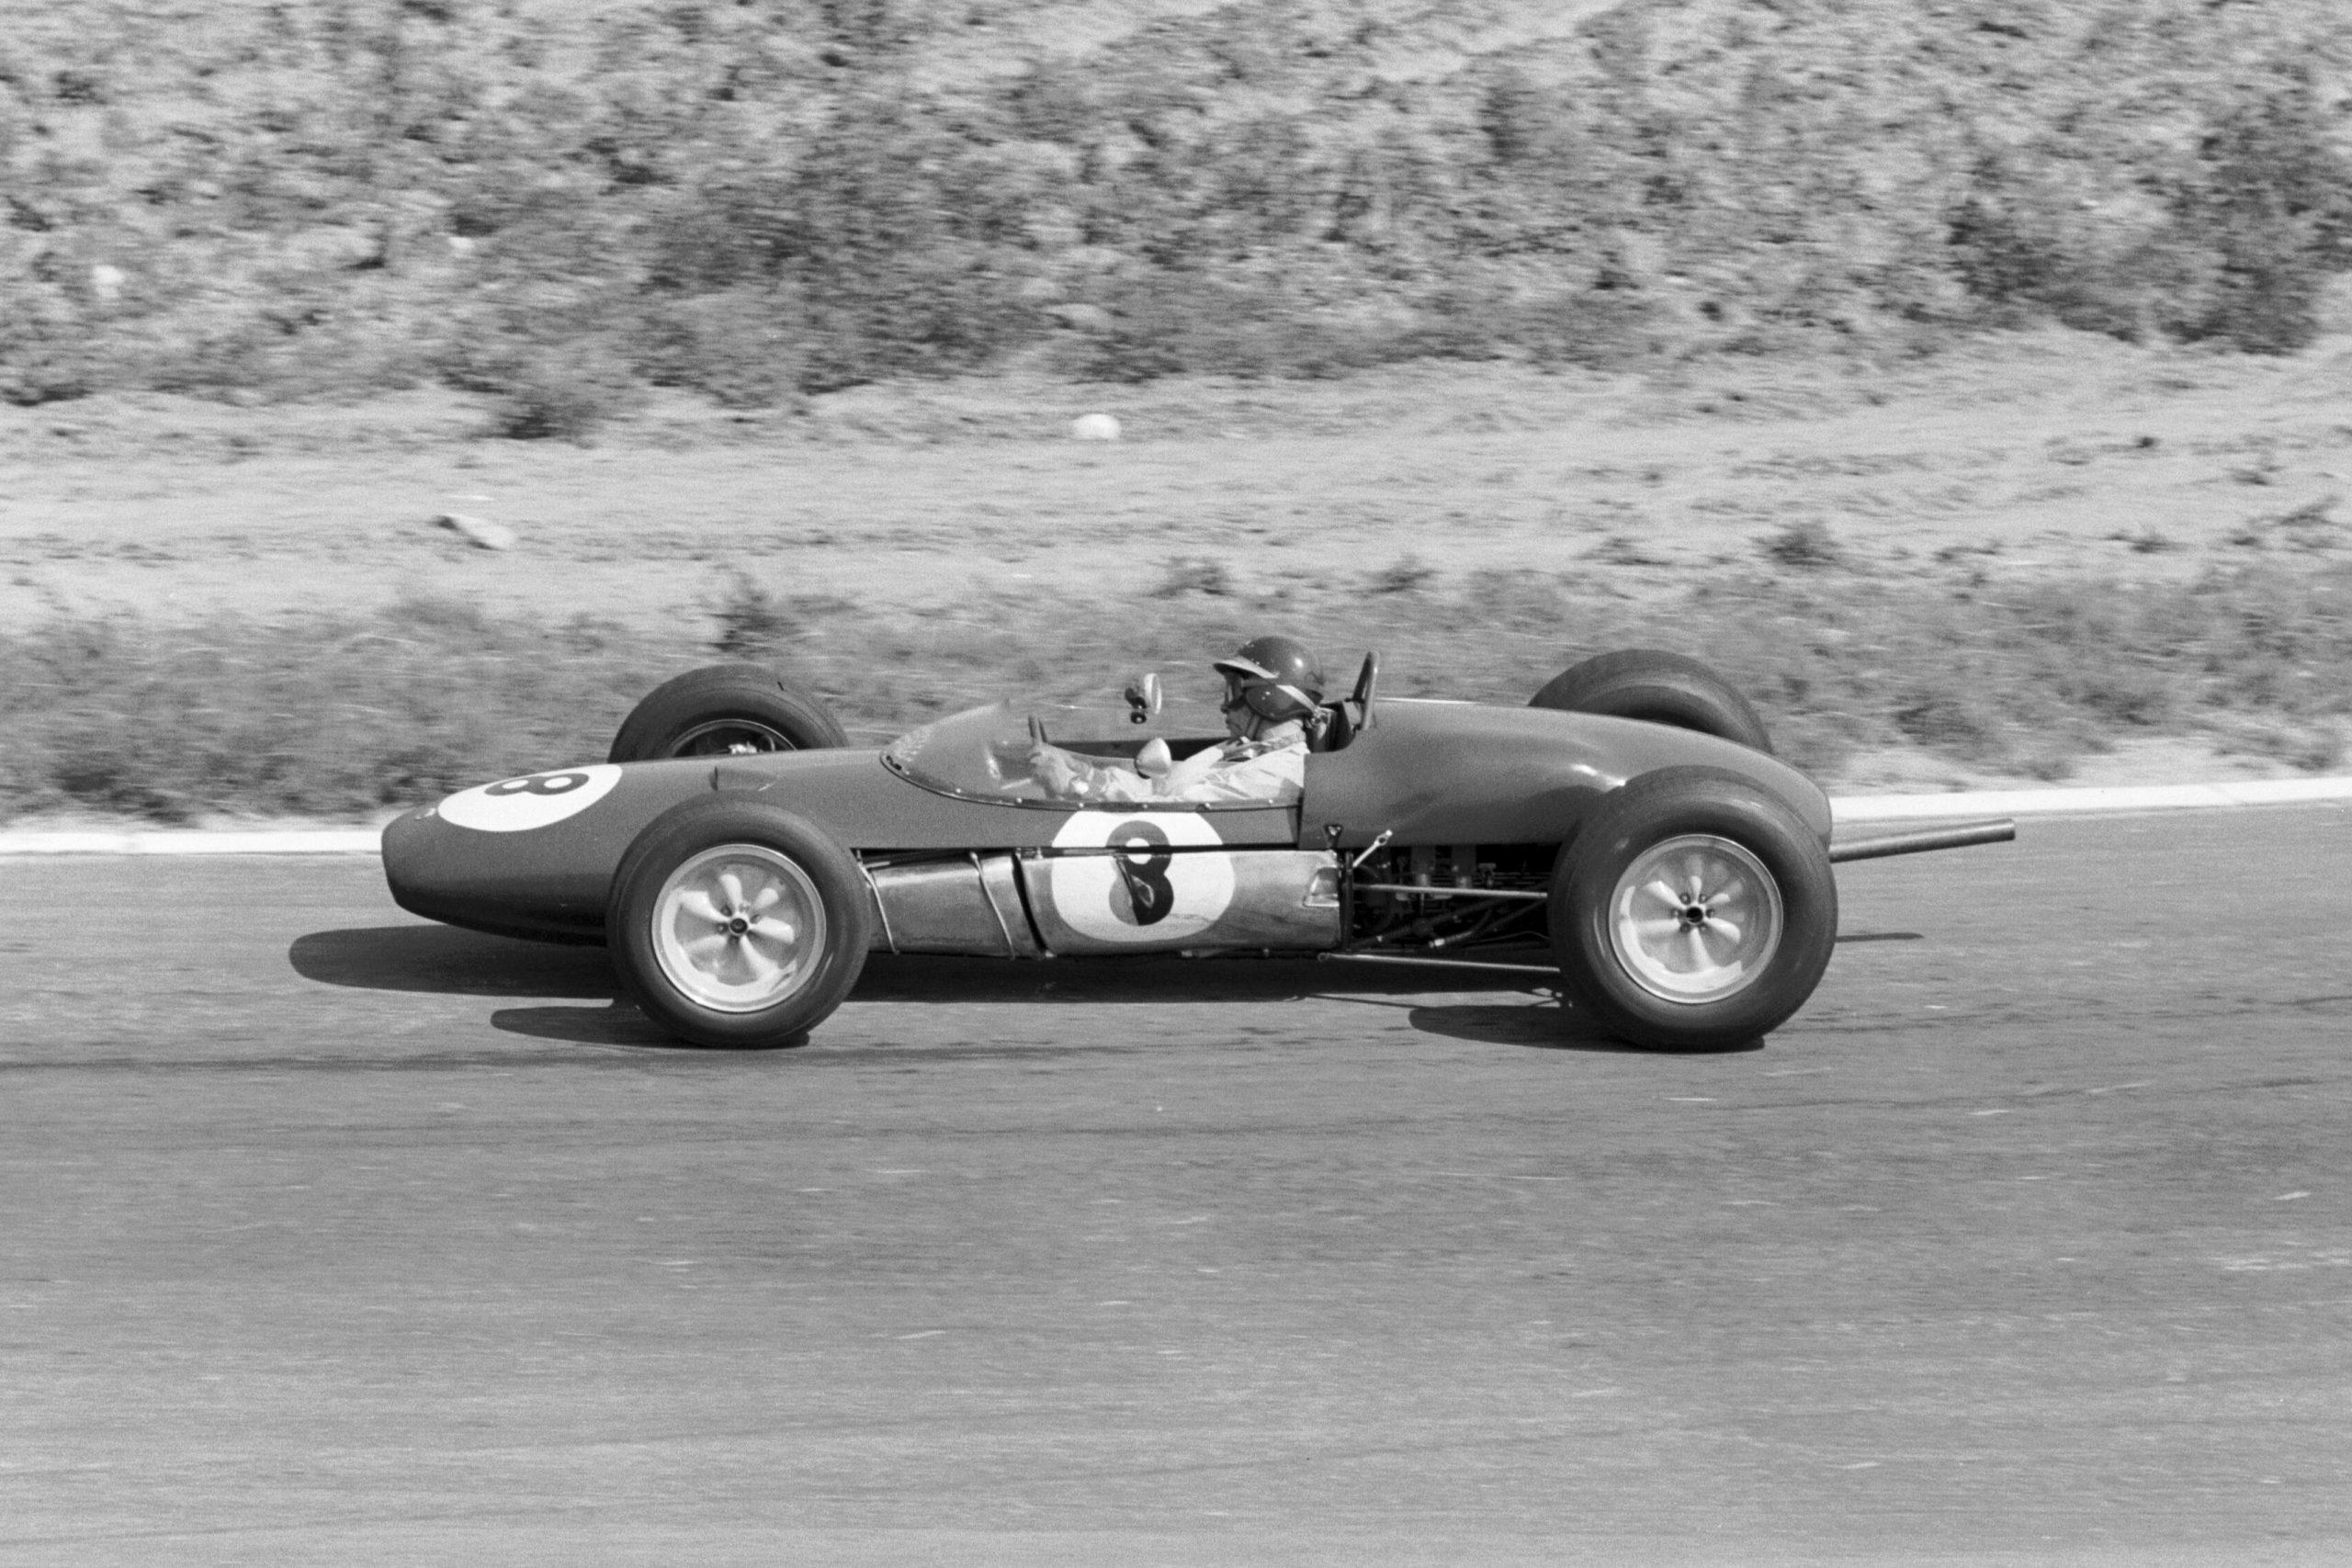 Jim Clark at the wheel of a Lotus 21.